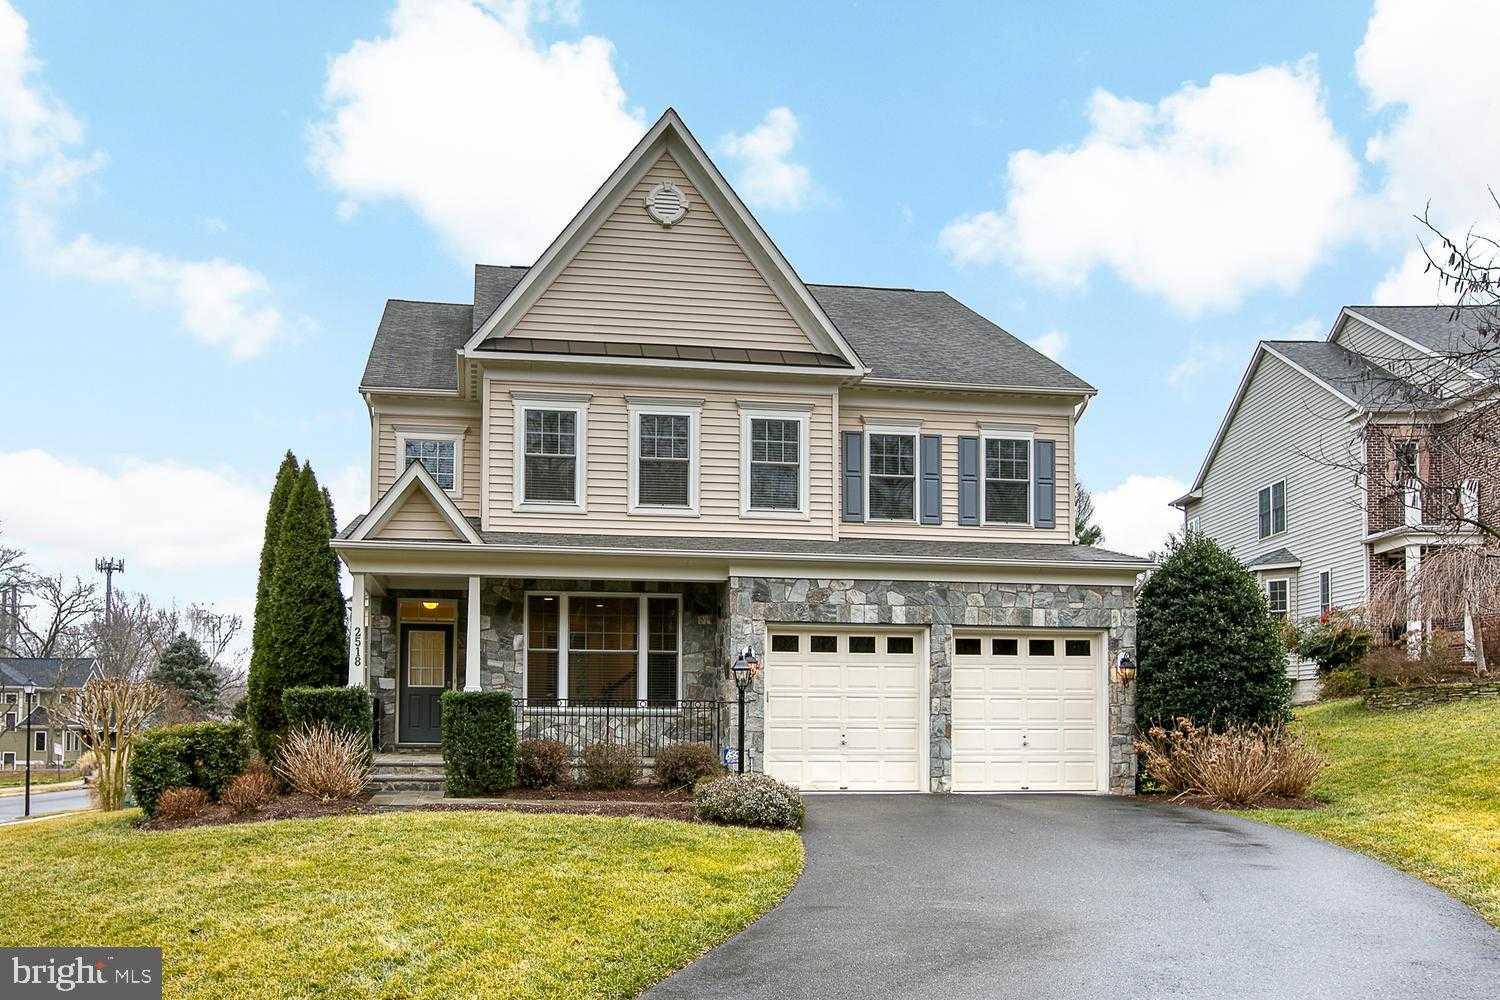 $1,059,000 - 5Br/5Ba -  for Sale in Linden Tree Estates, Falls Church